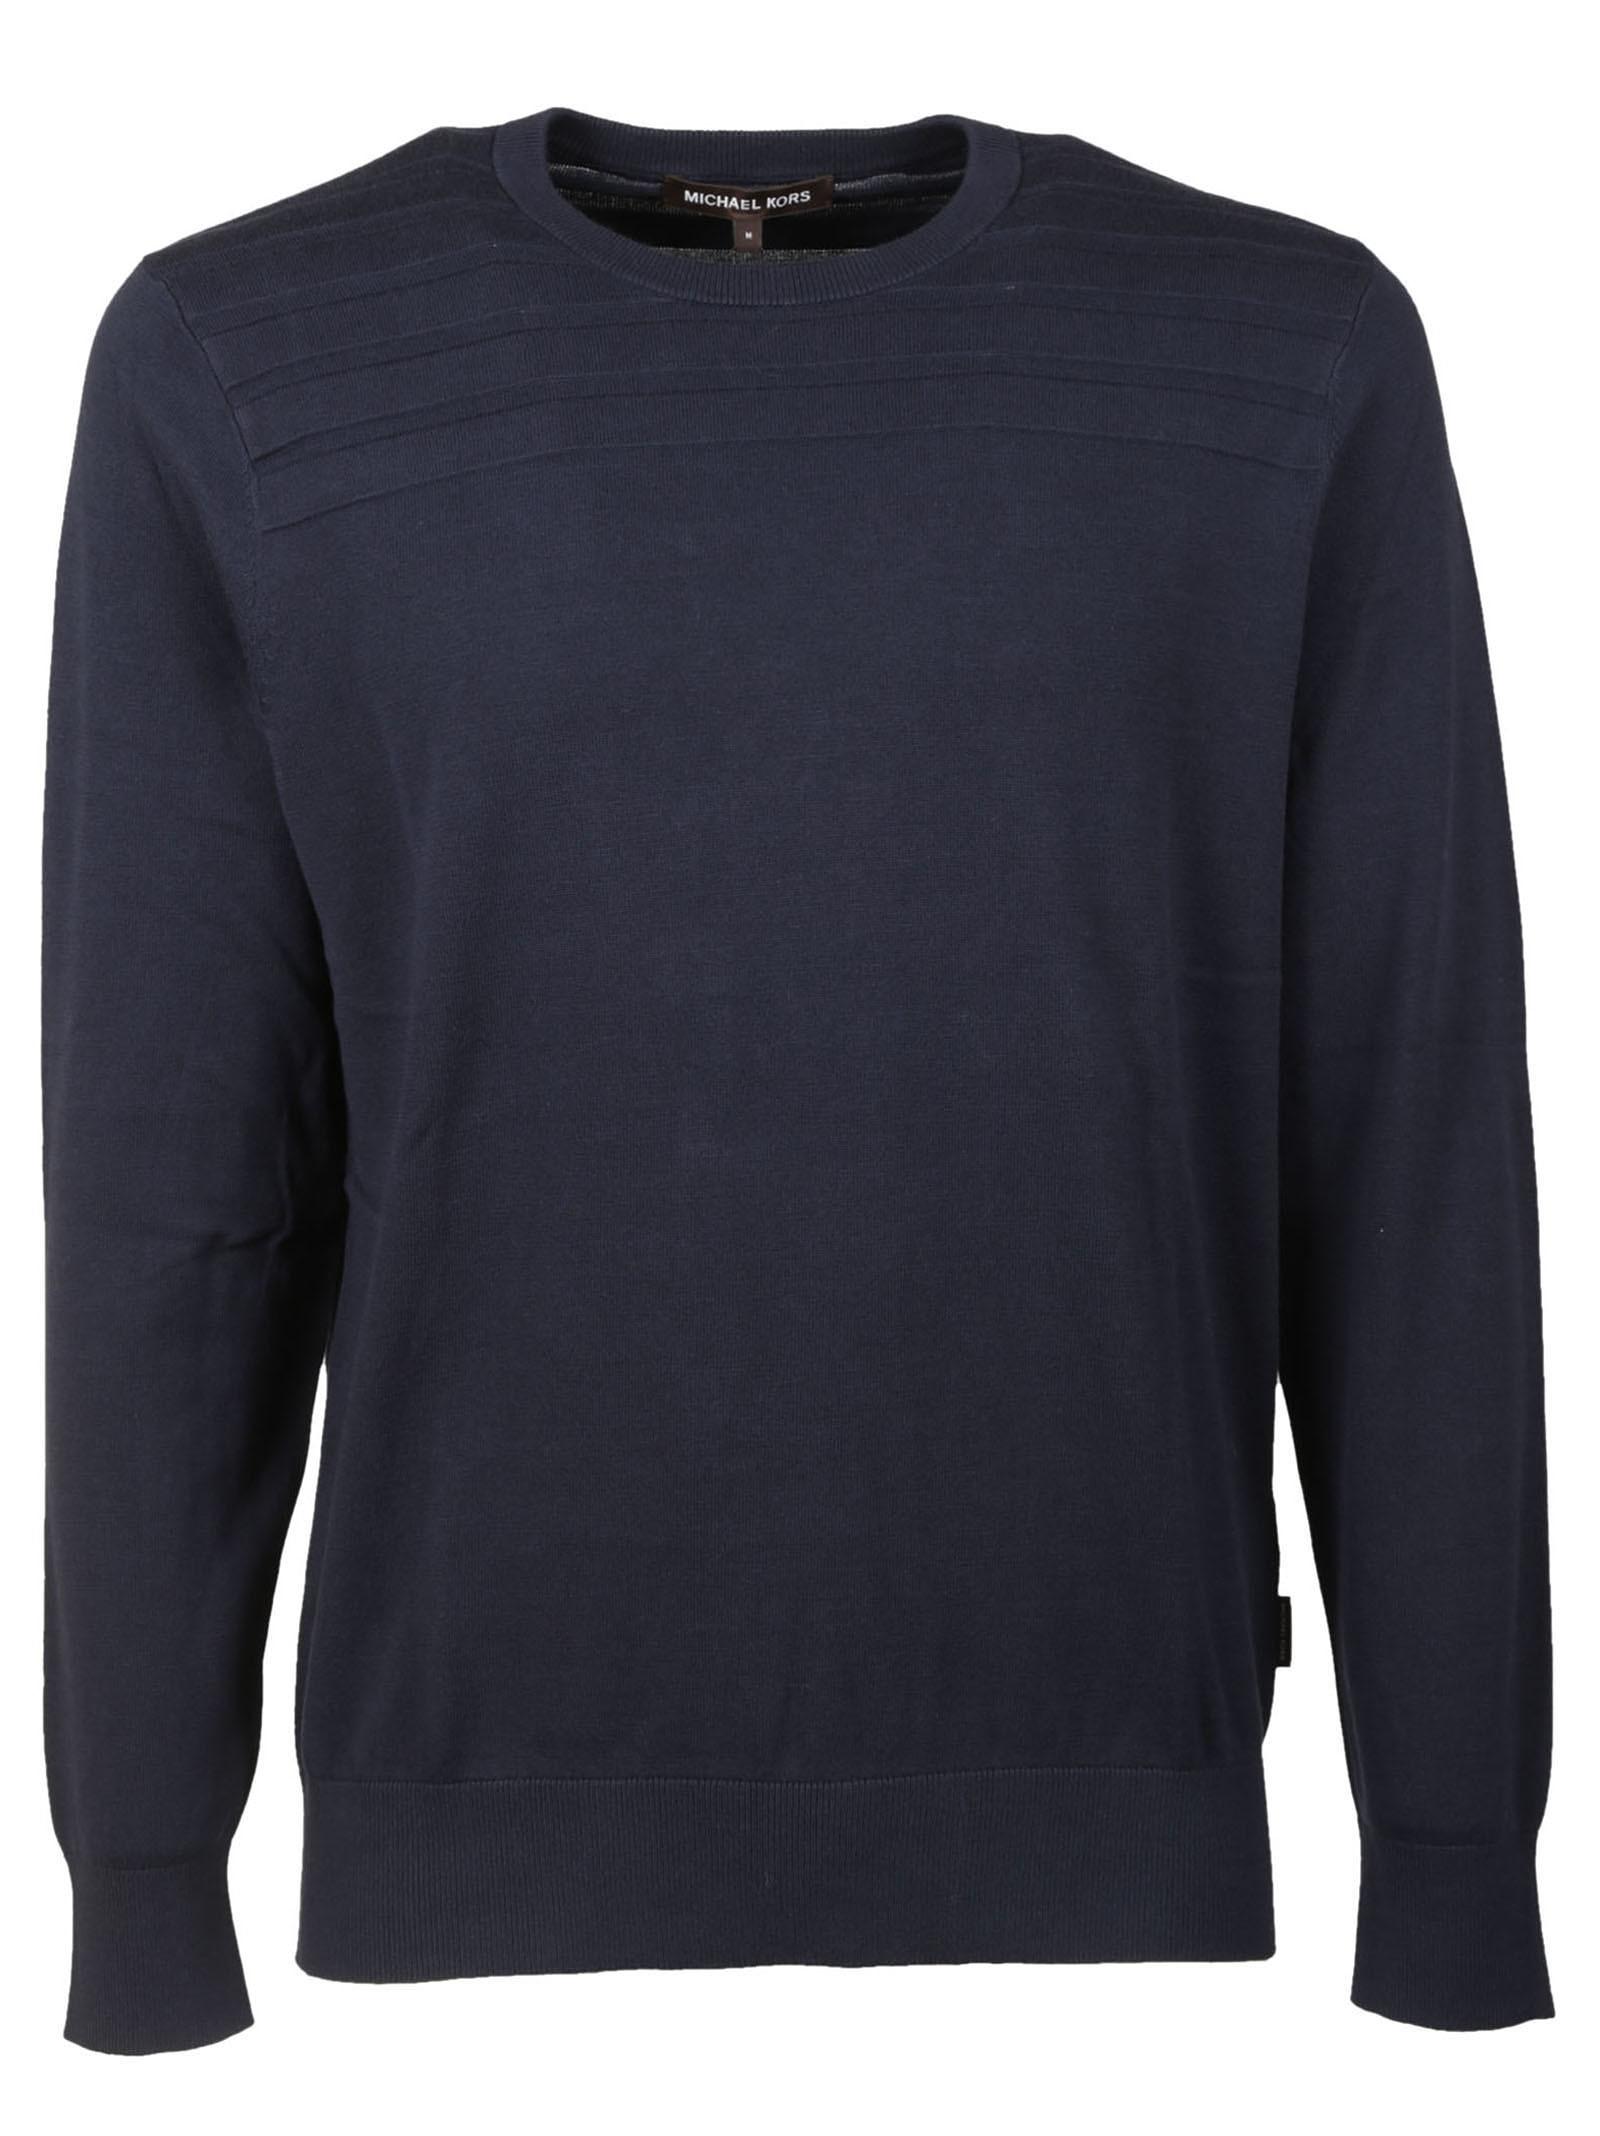 michael kors male michael kors crew neck sweatshirt